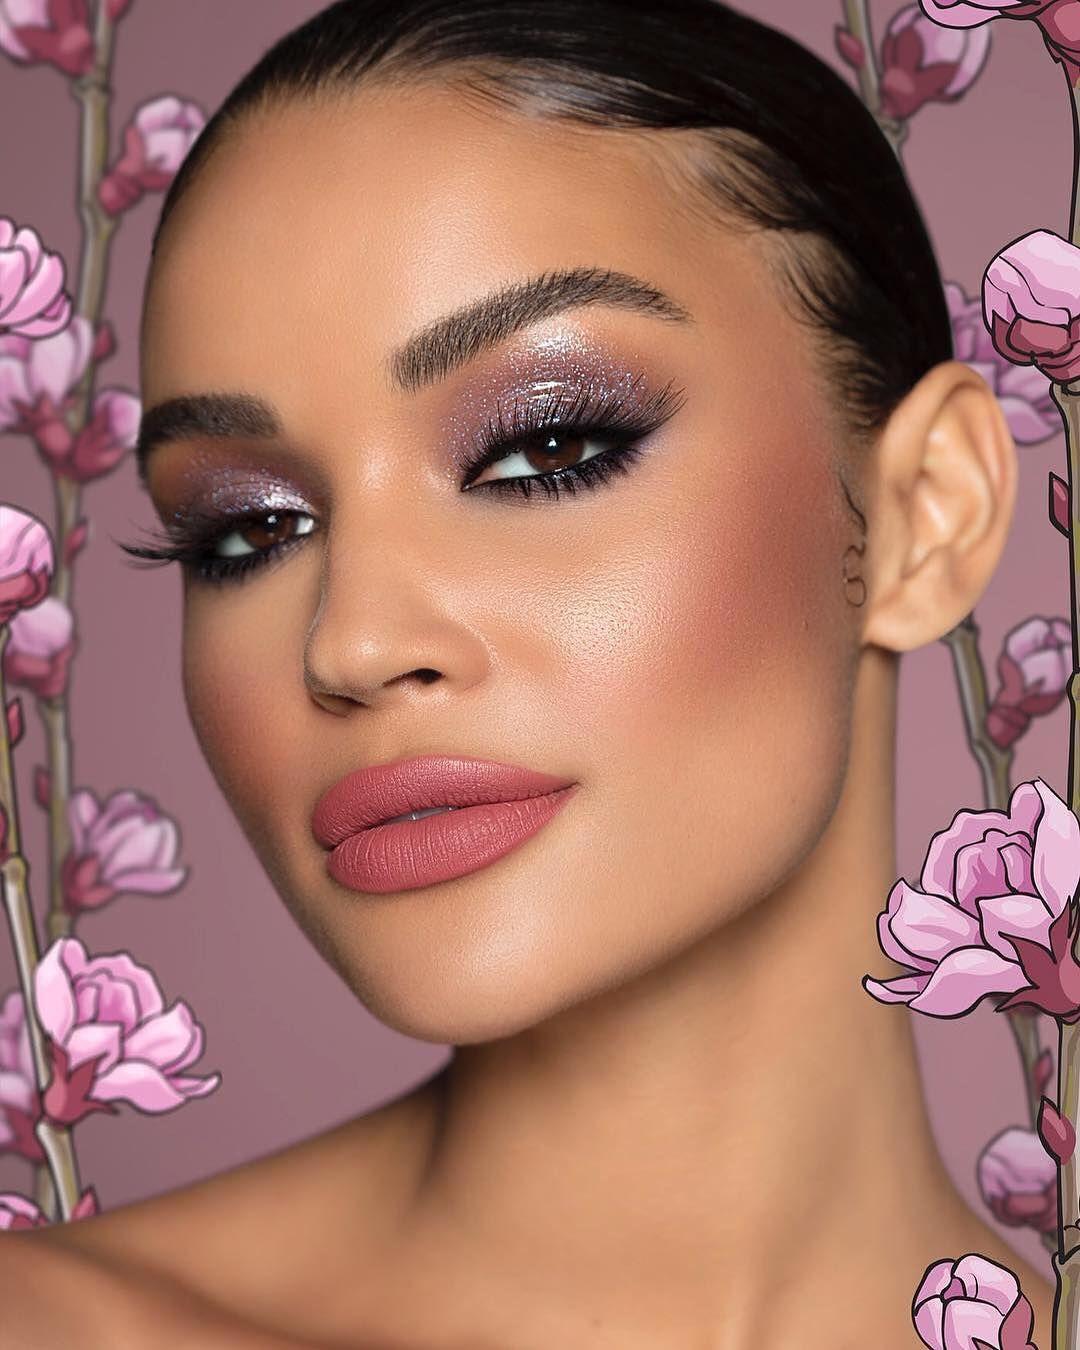 Jordan Liberty does it again! The PRO makeup artist